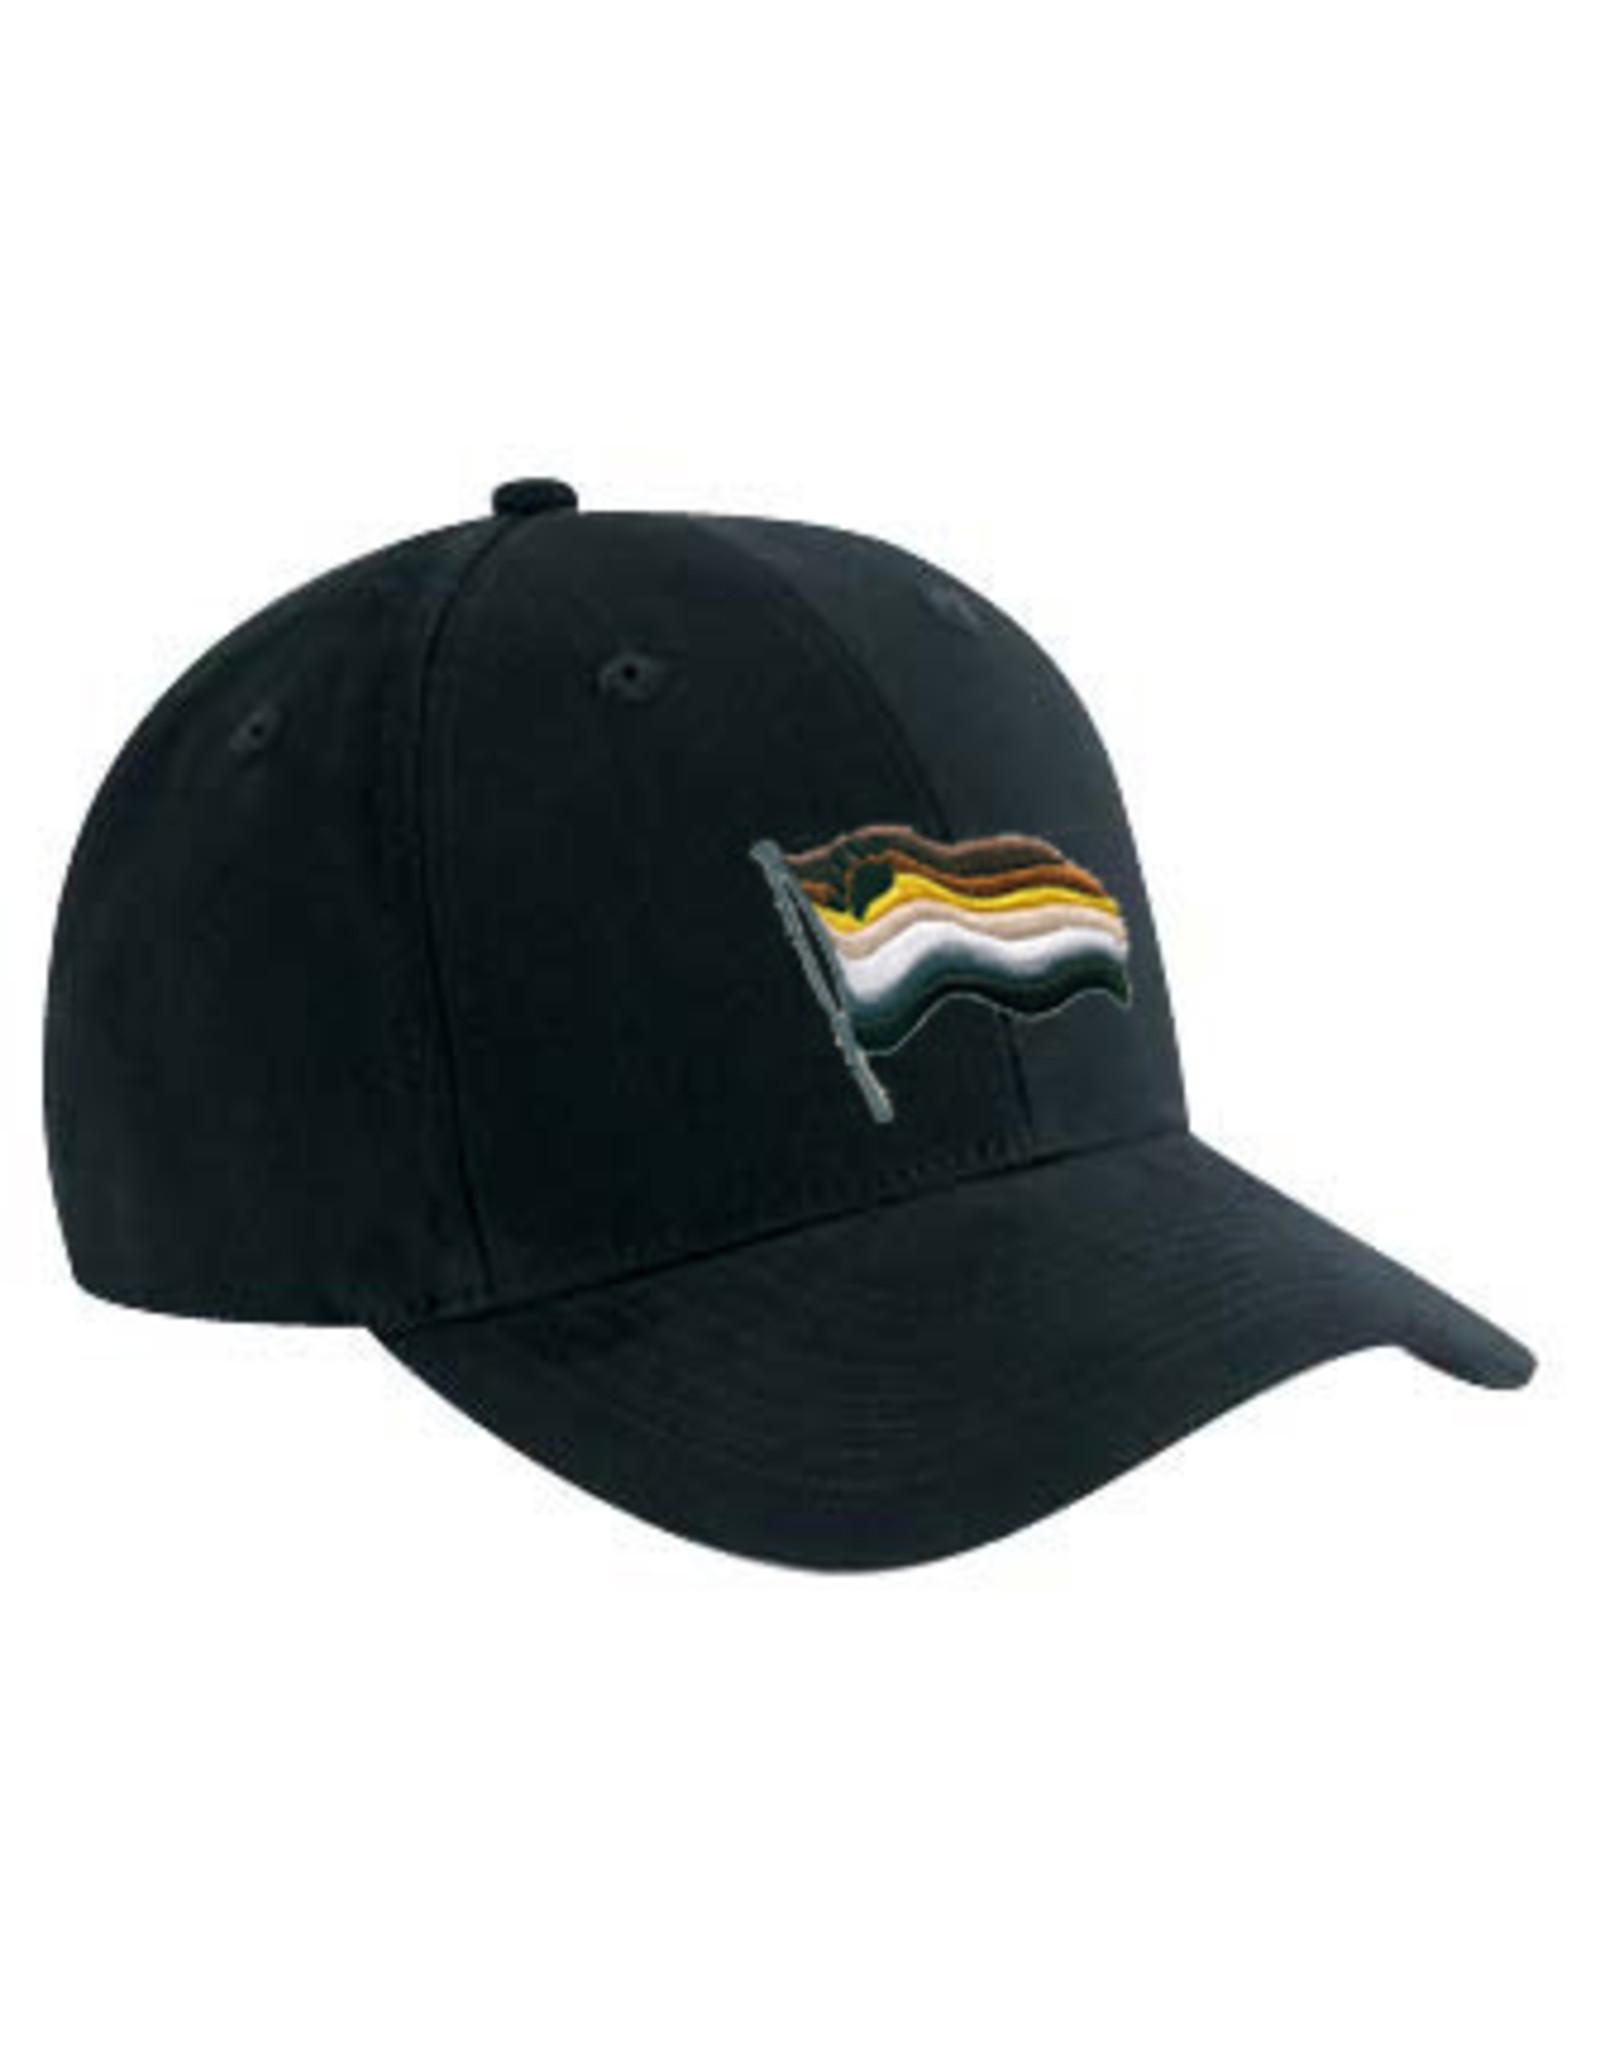 RAINBOW BEAR PRIDE WAVY FLAG EMBROIDERED BLACK CAP